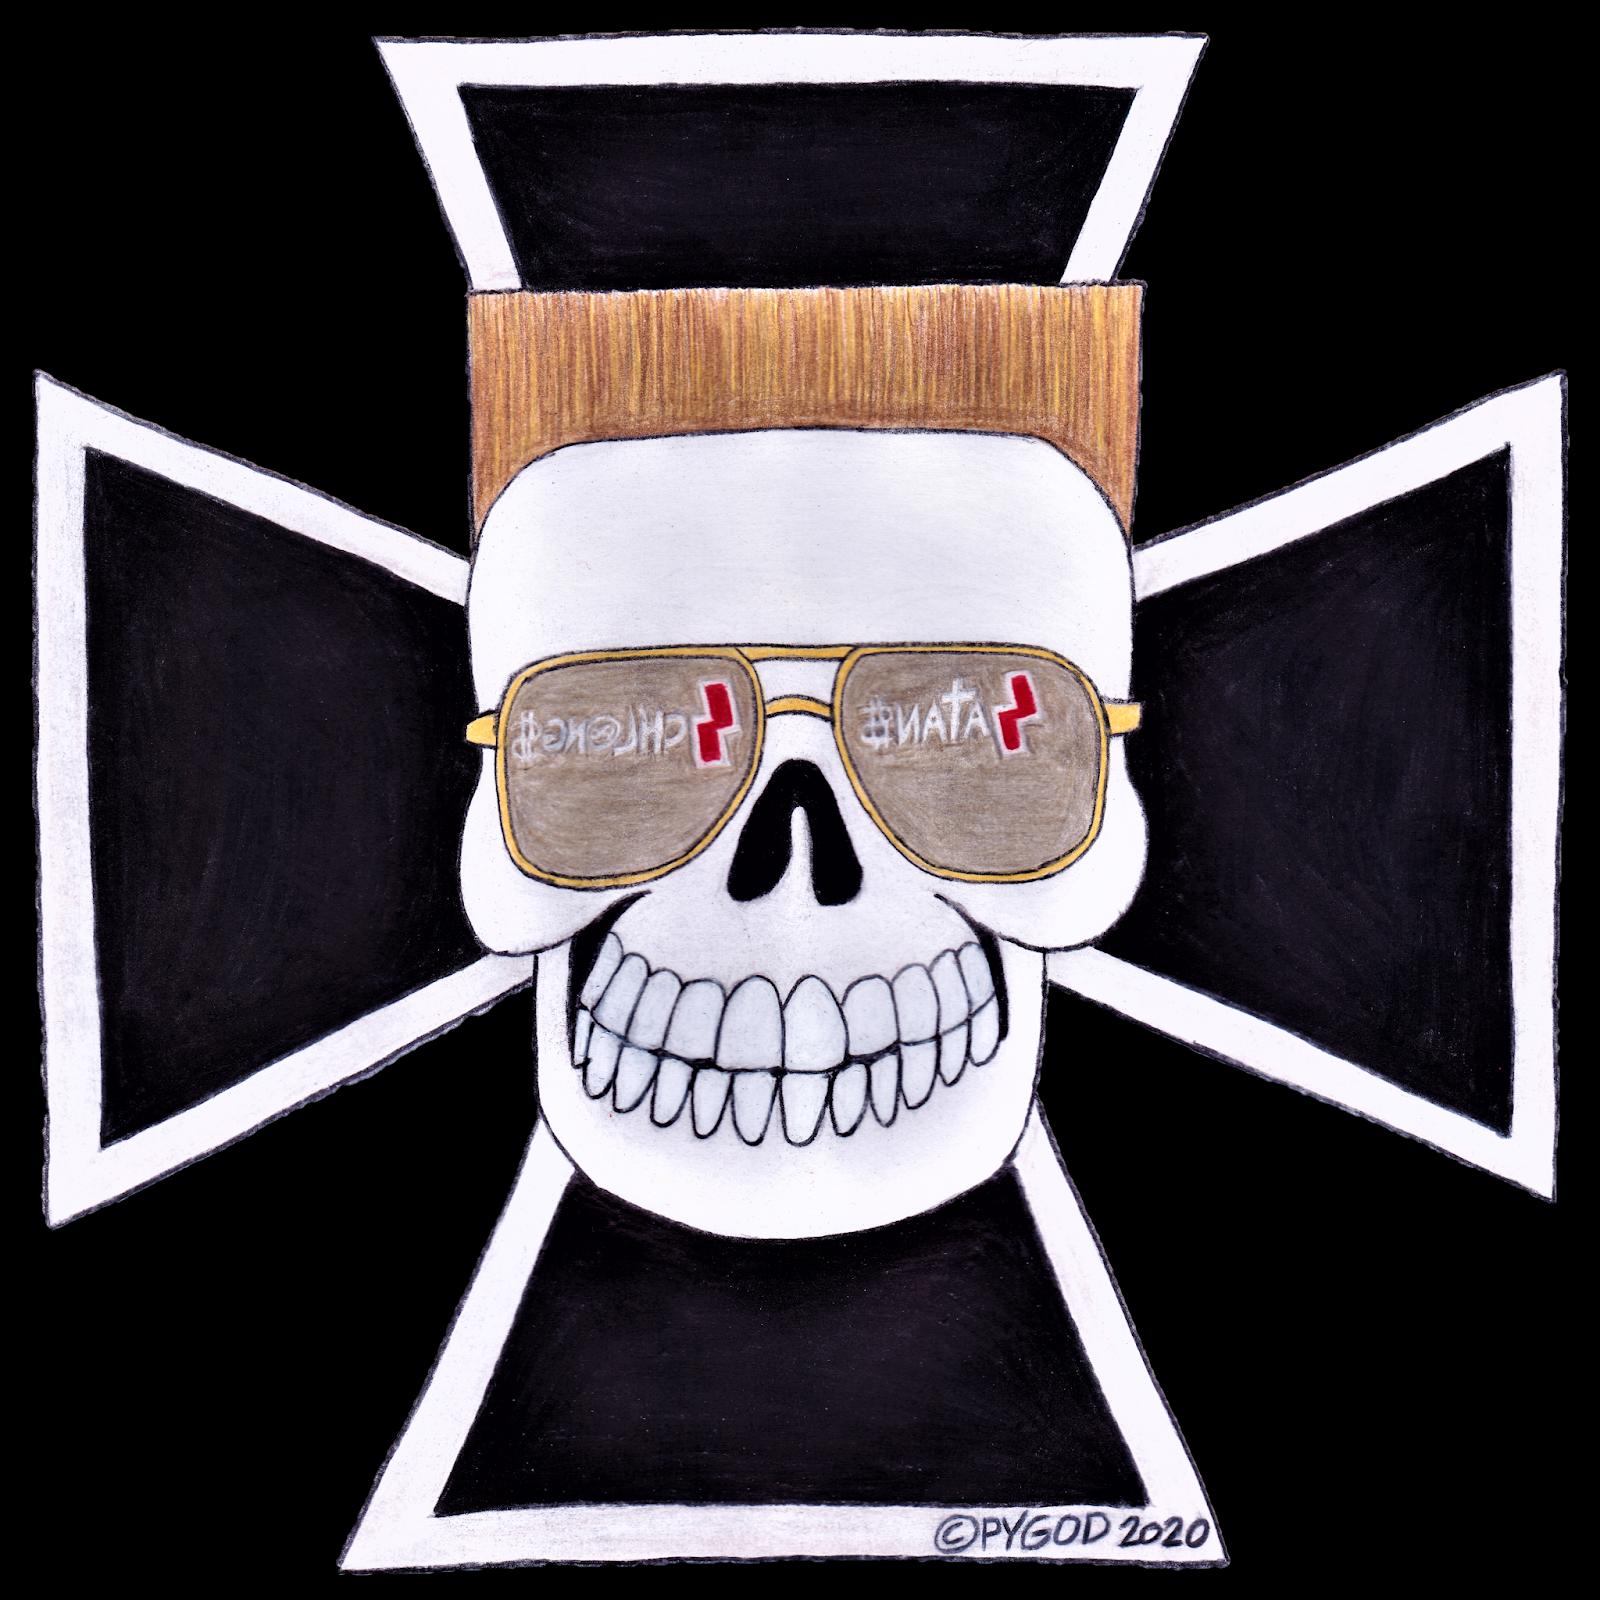 5- PYGOD Skull Logo